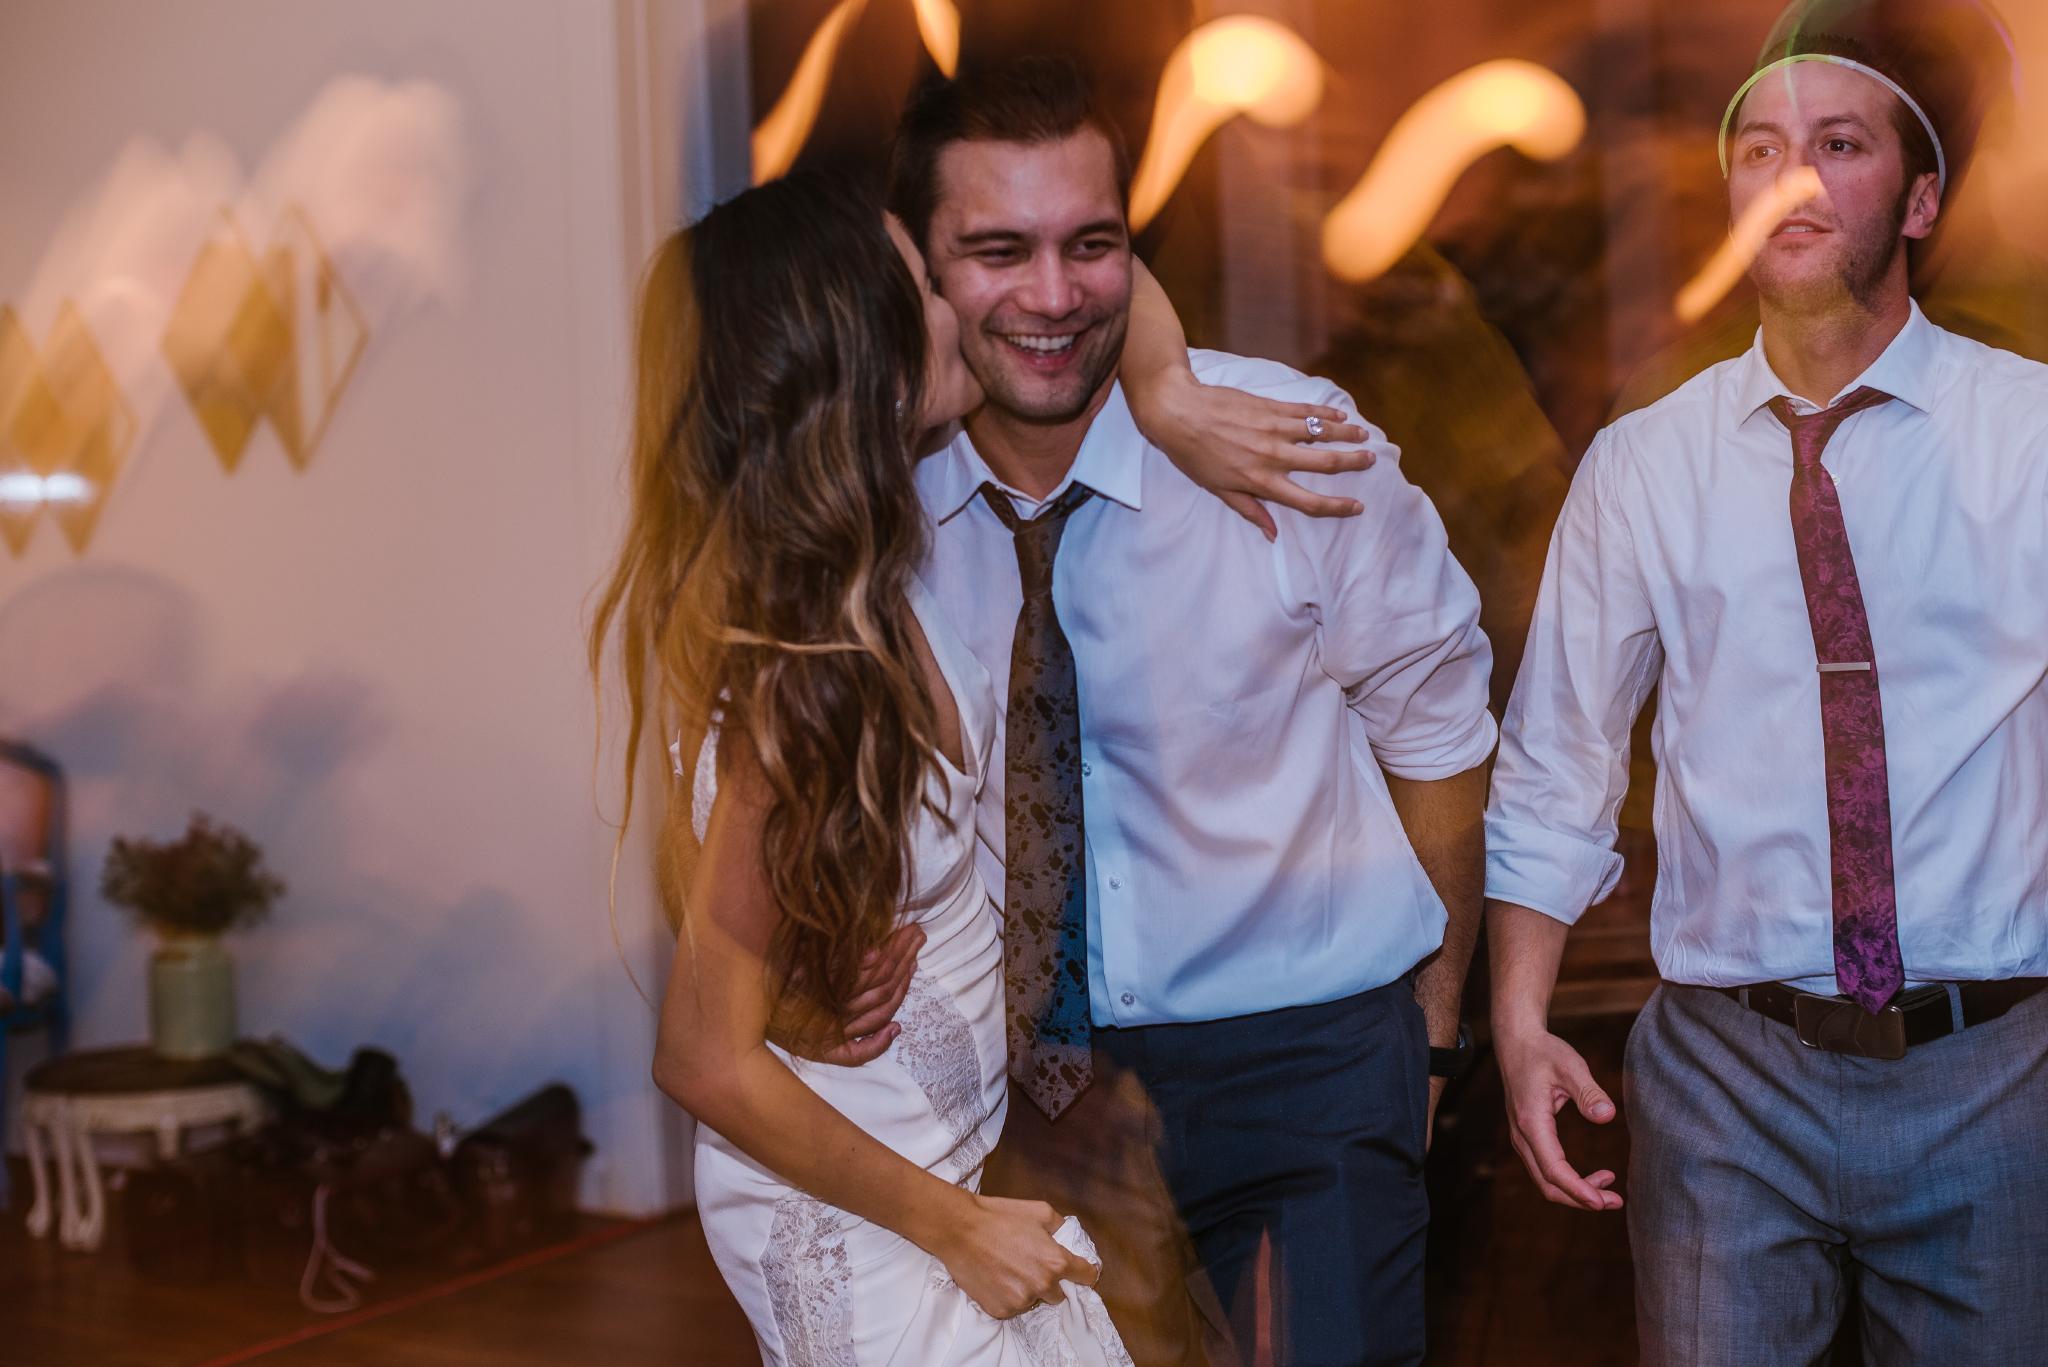 san diego wedding   photographer   bride kissing man on cheek on dance floor